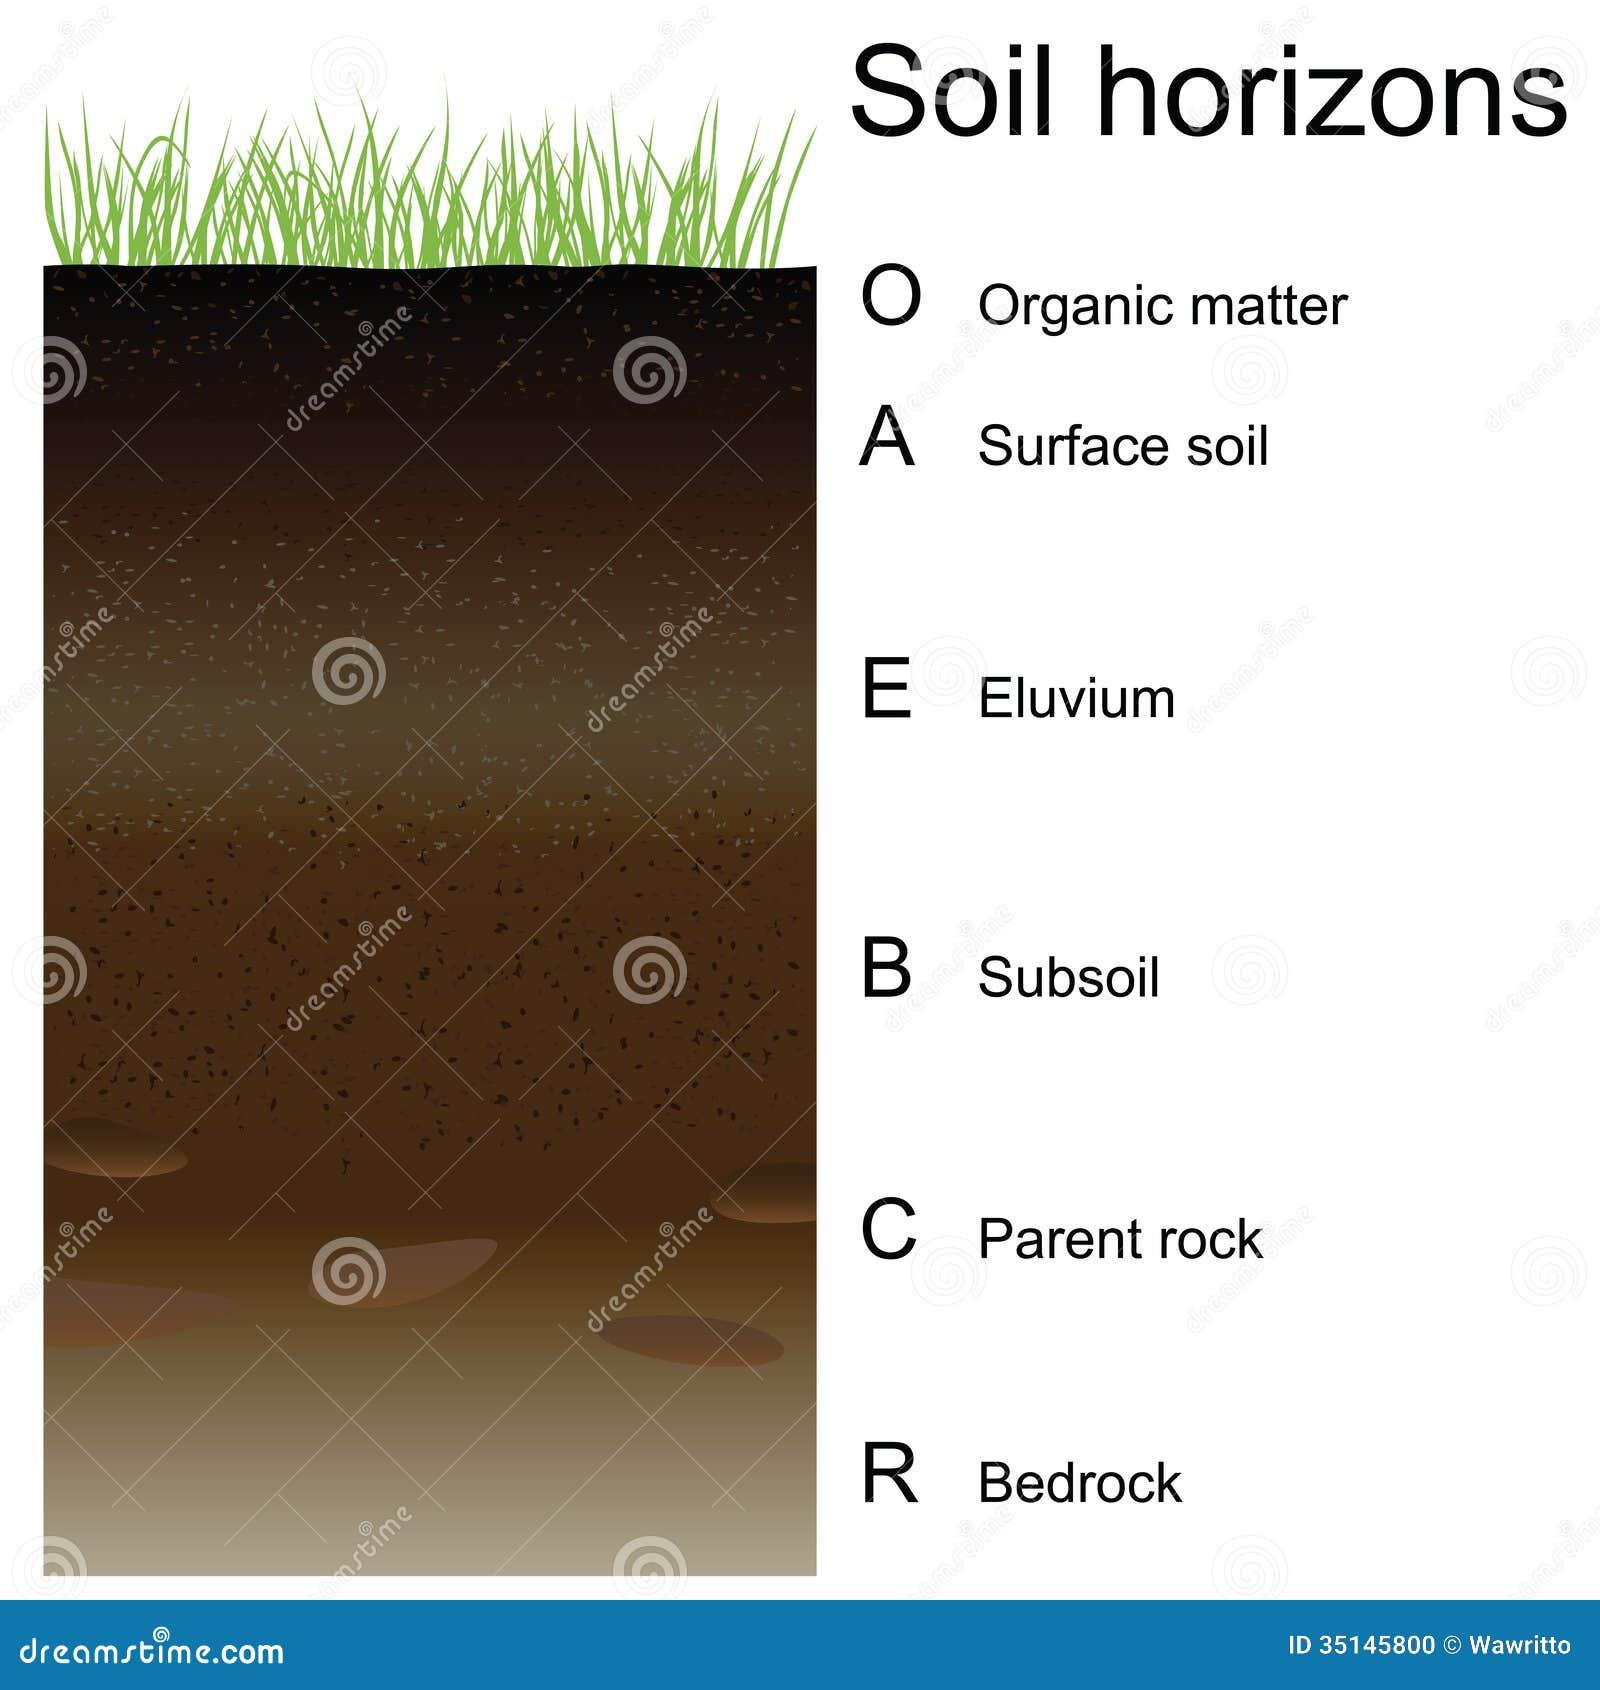 Worksheets Soil Horizons Worksheet soil horizons worksheet dominantni info do vetor de horizontes solo camadas foto horizons